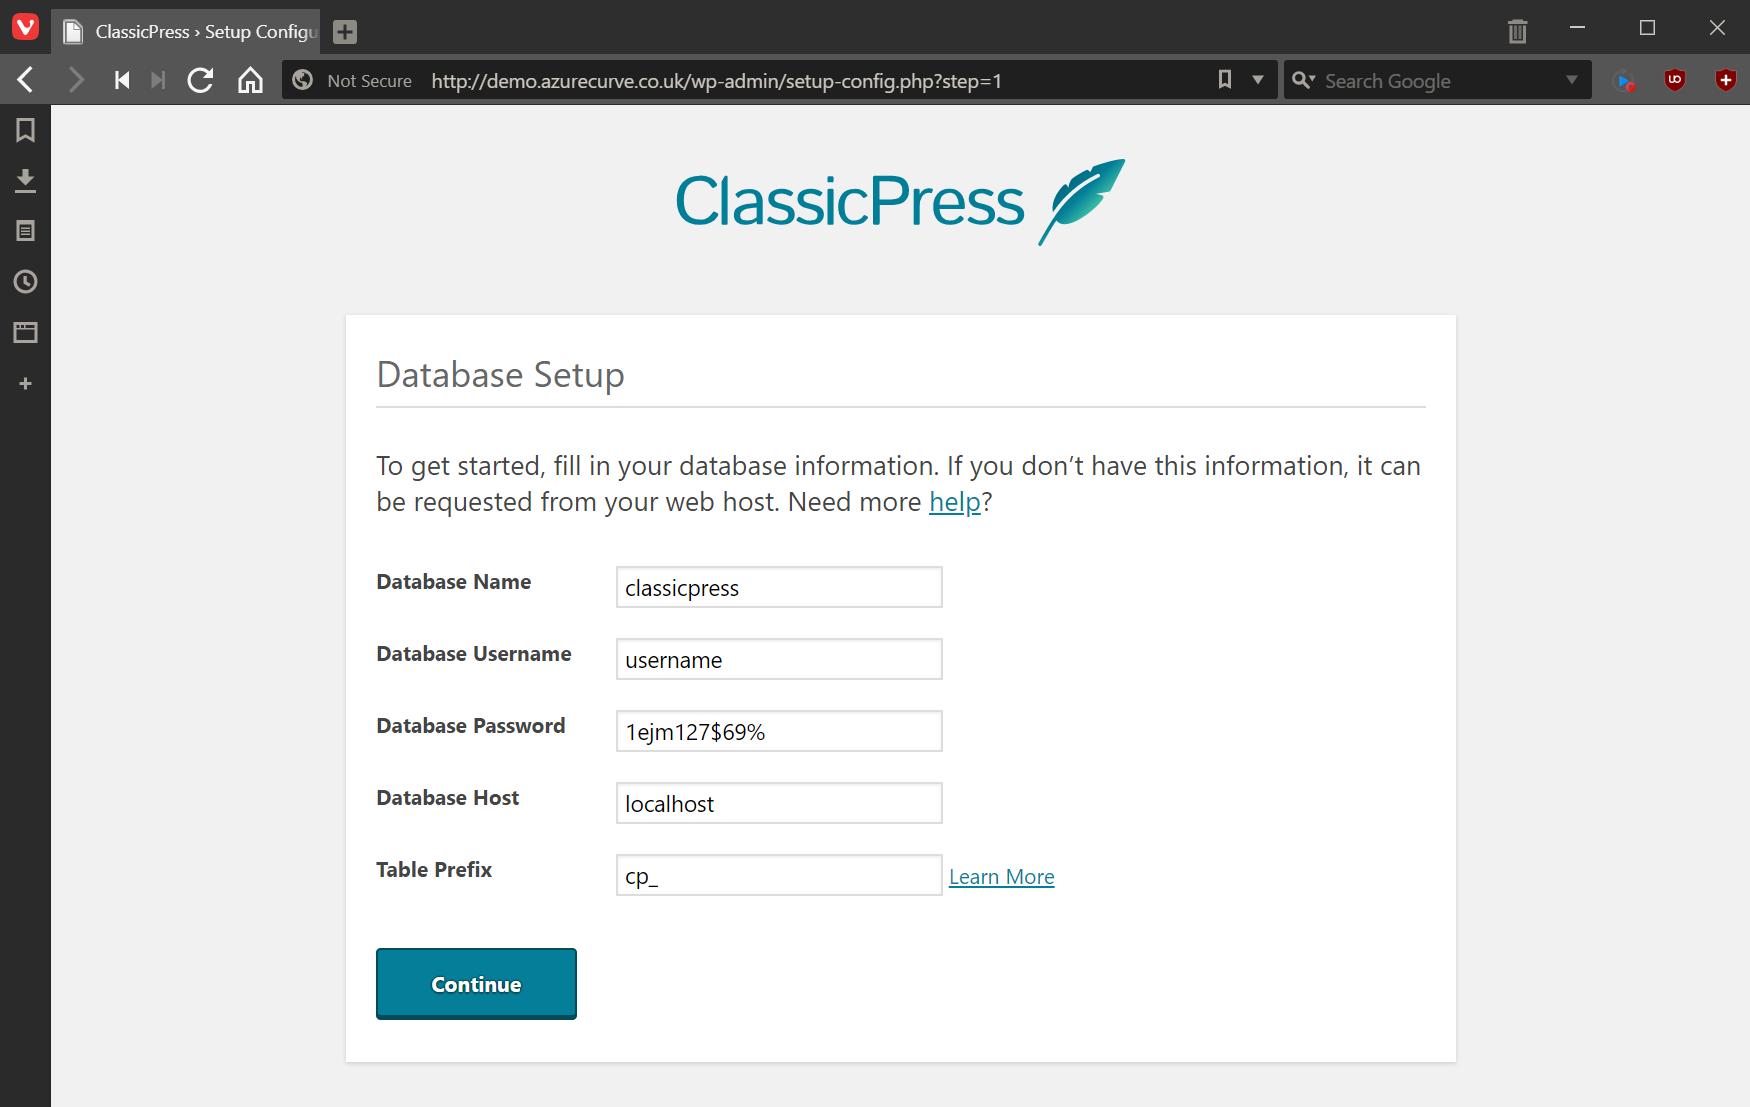 ClassicPress Database Setup